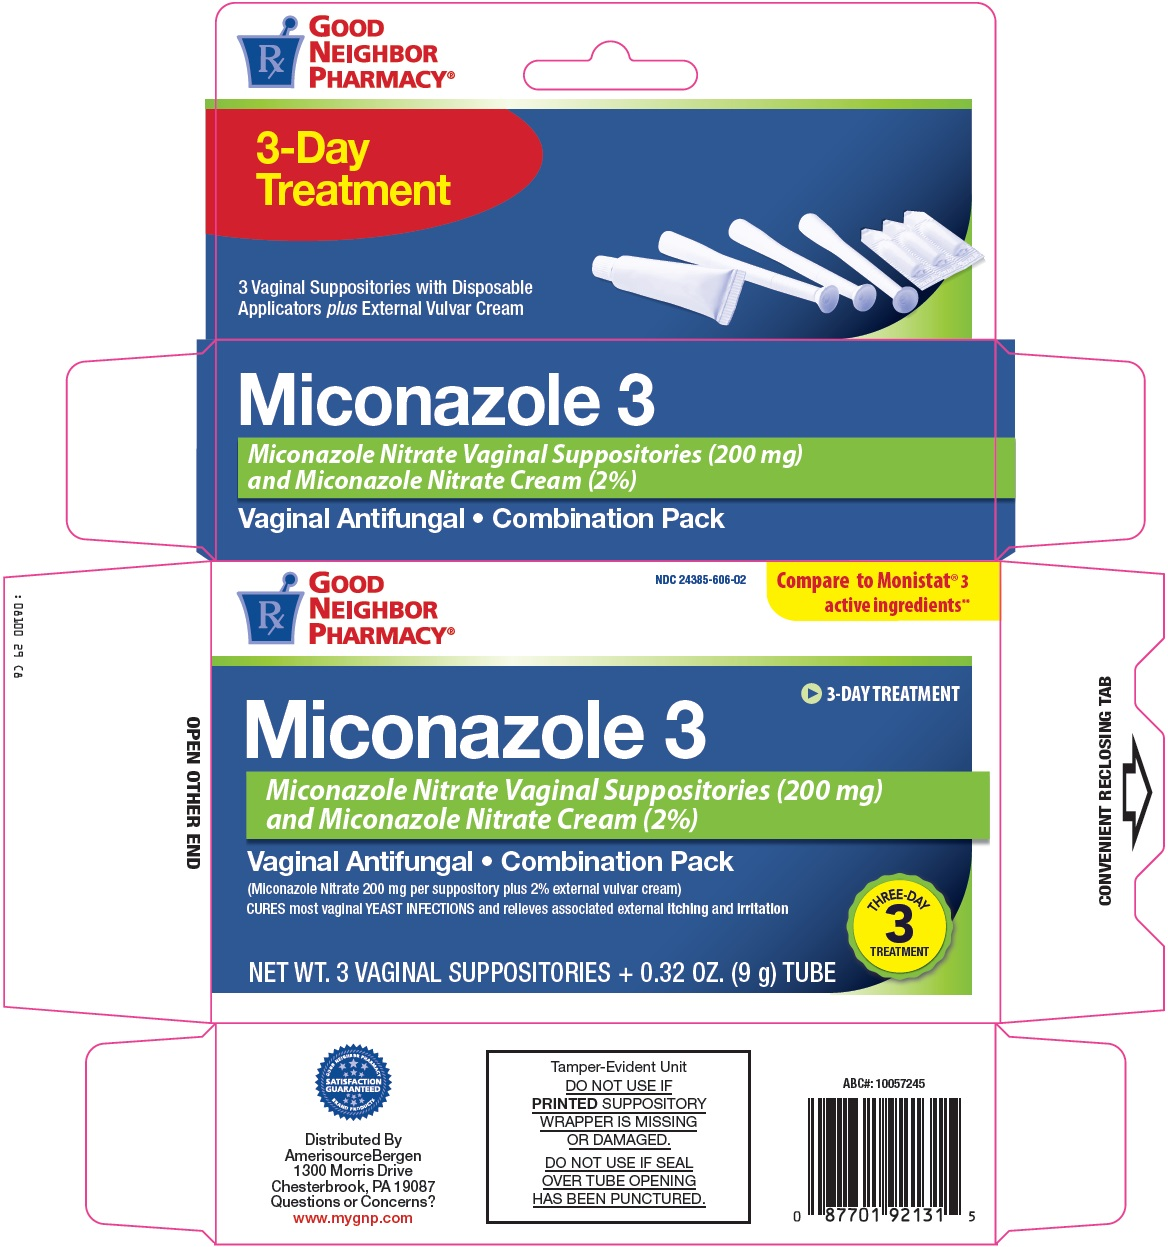 Miconazole 3 image 1